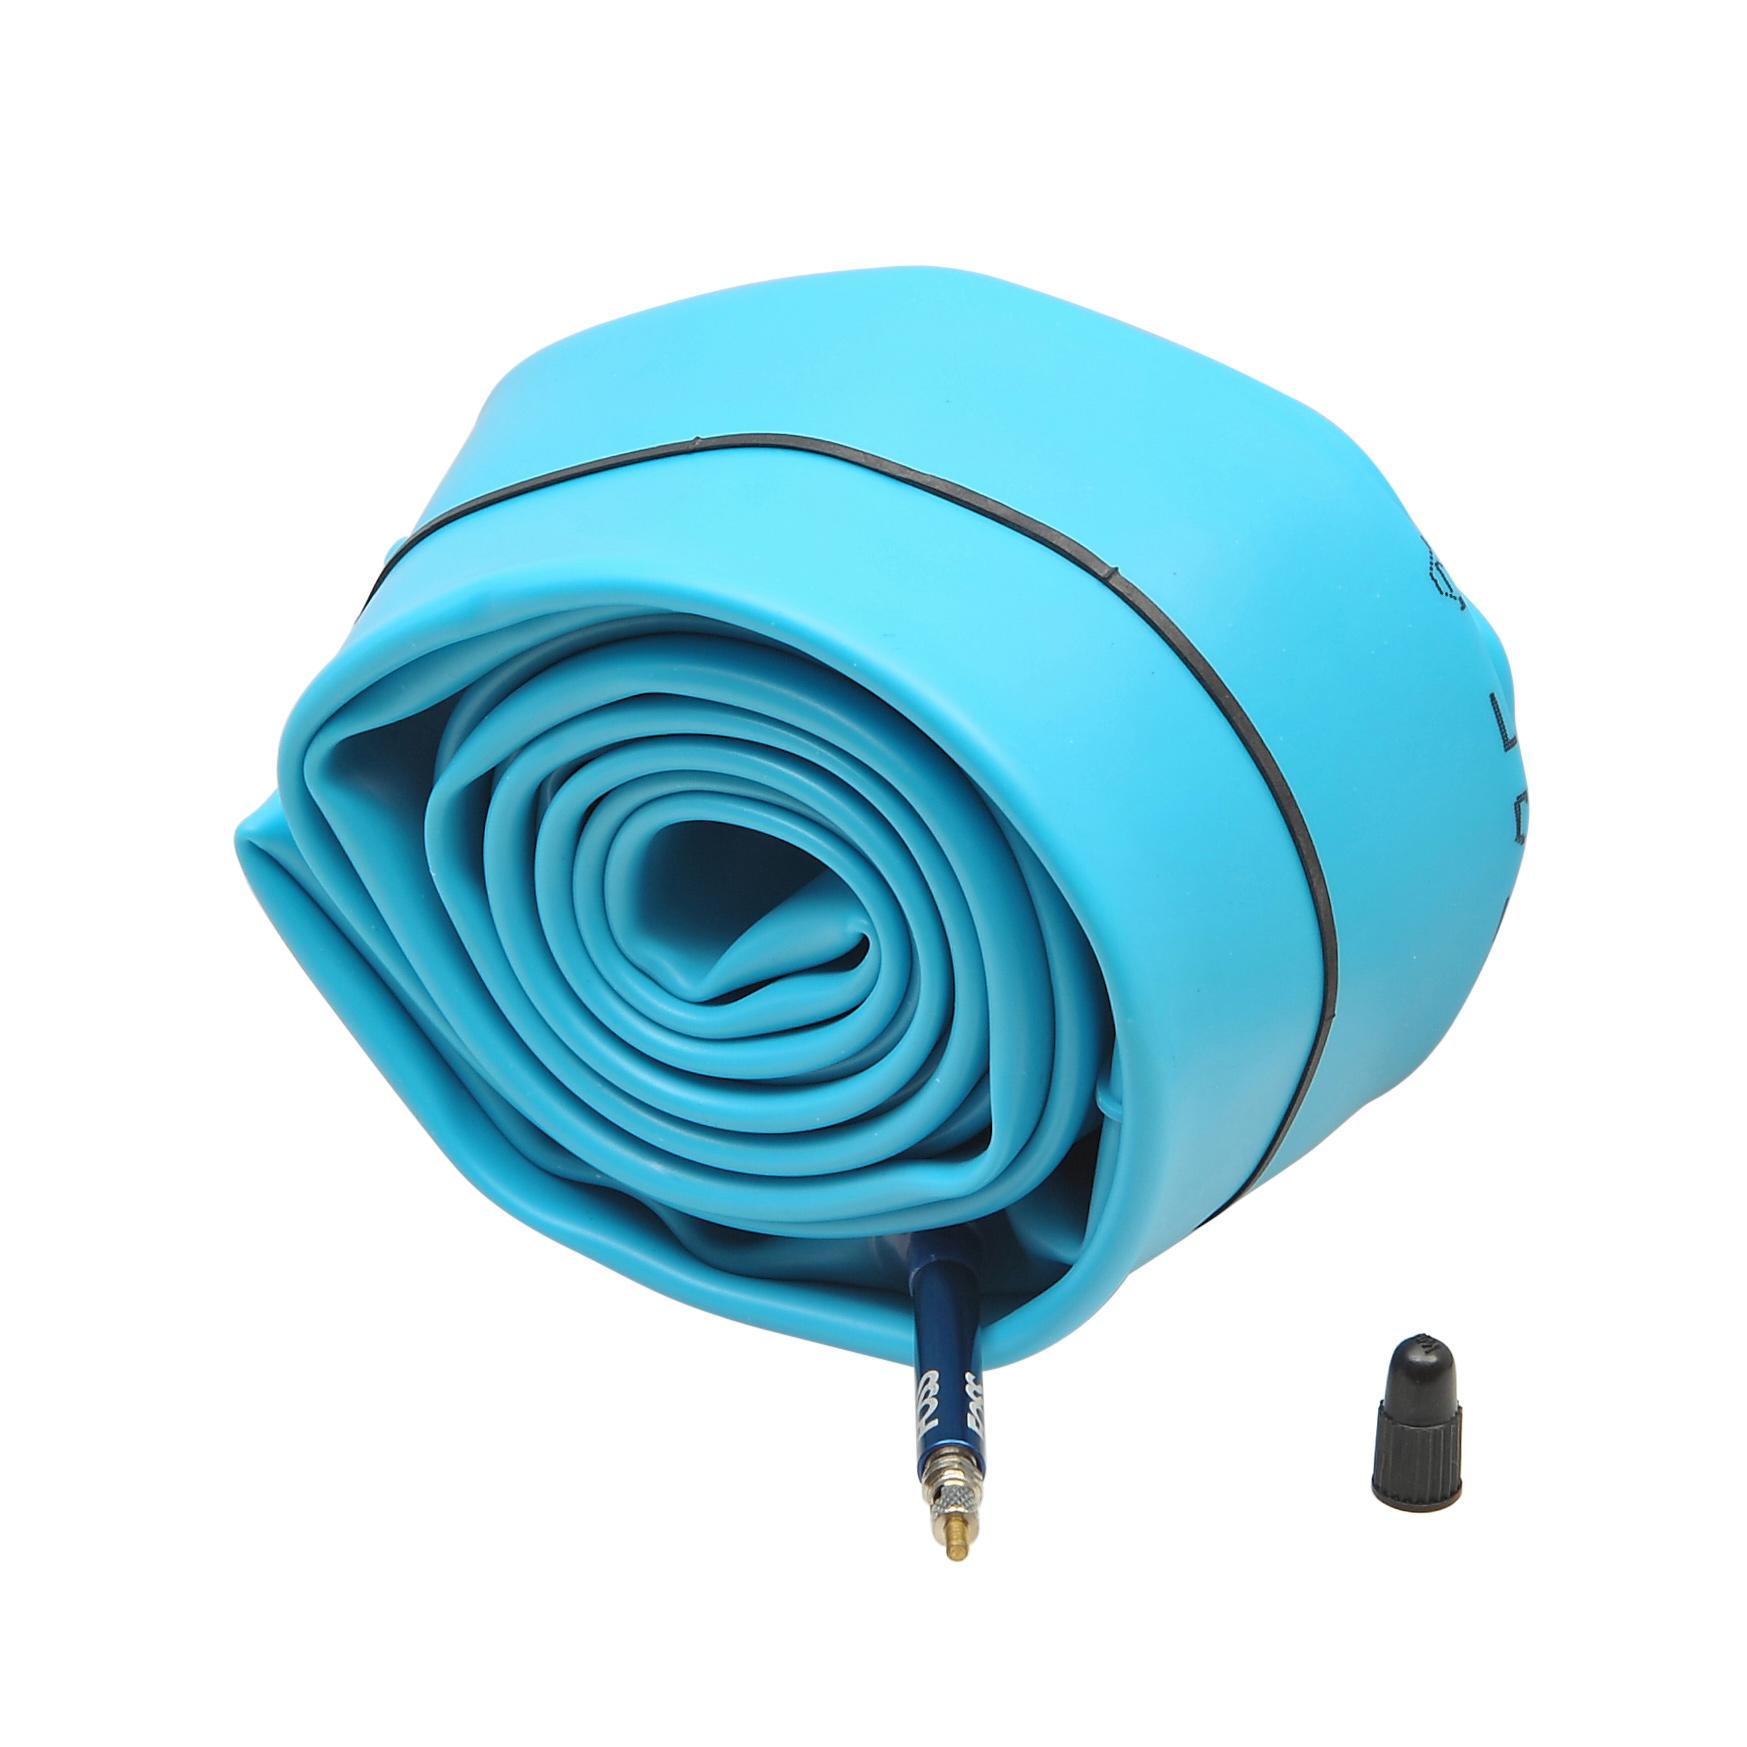 Chambre air foss 26x1 95 2 50 presta 50 mm probikeshop for Chambre a air velo 26x1 95